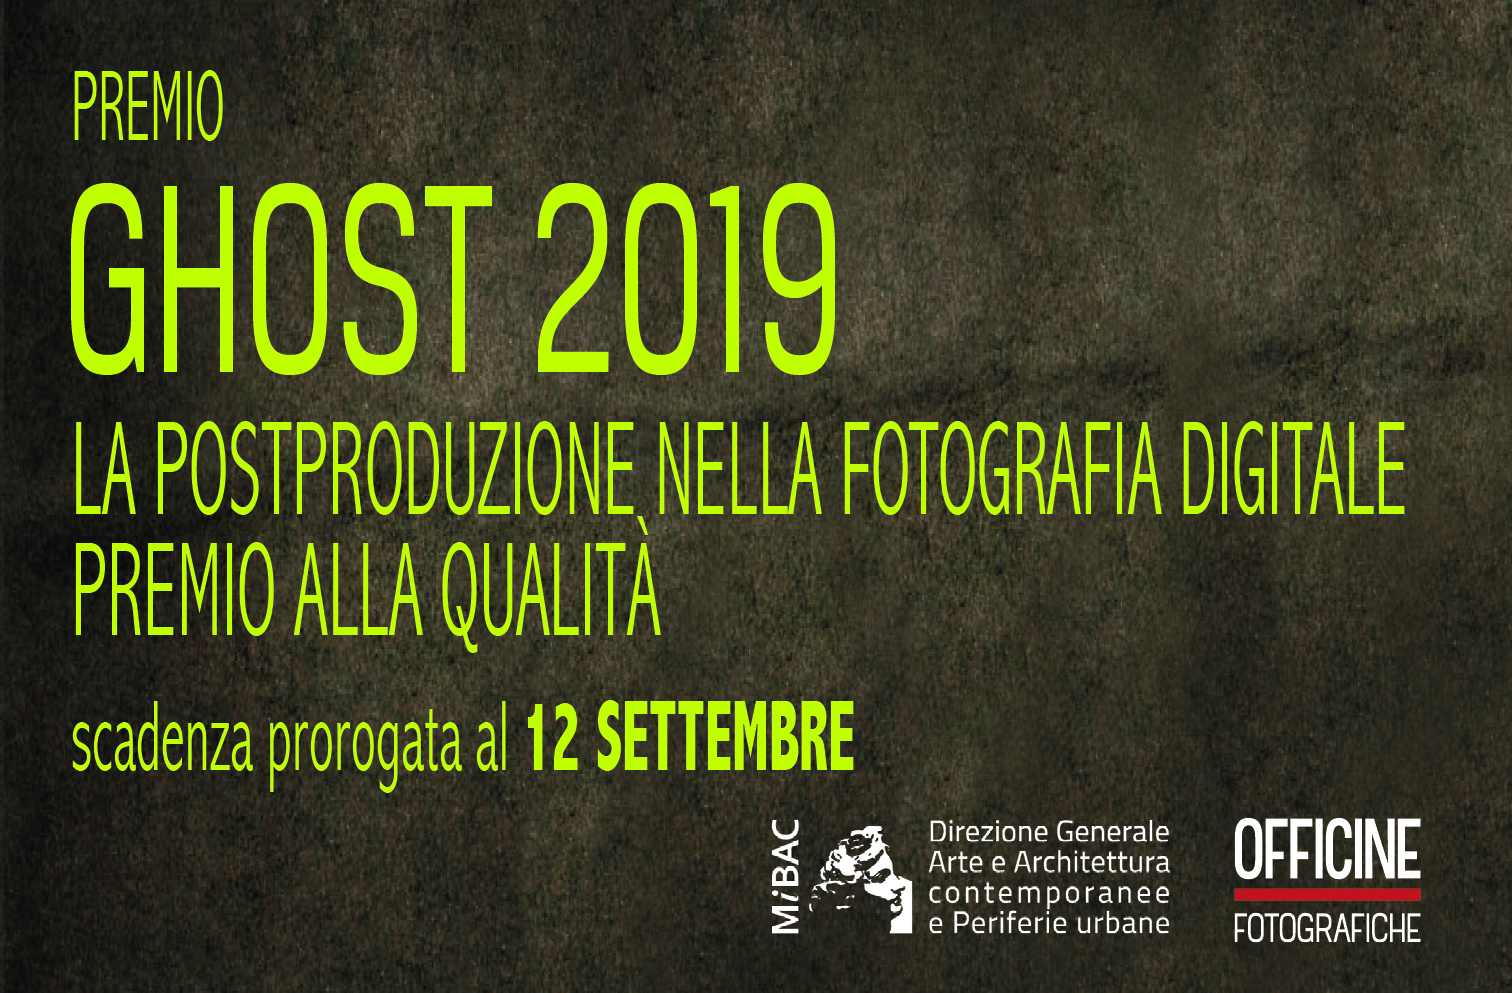 Premio_Ghost_2019 web-LIME